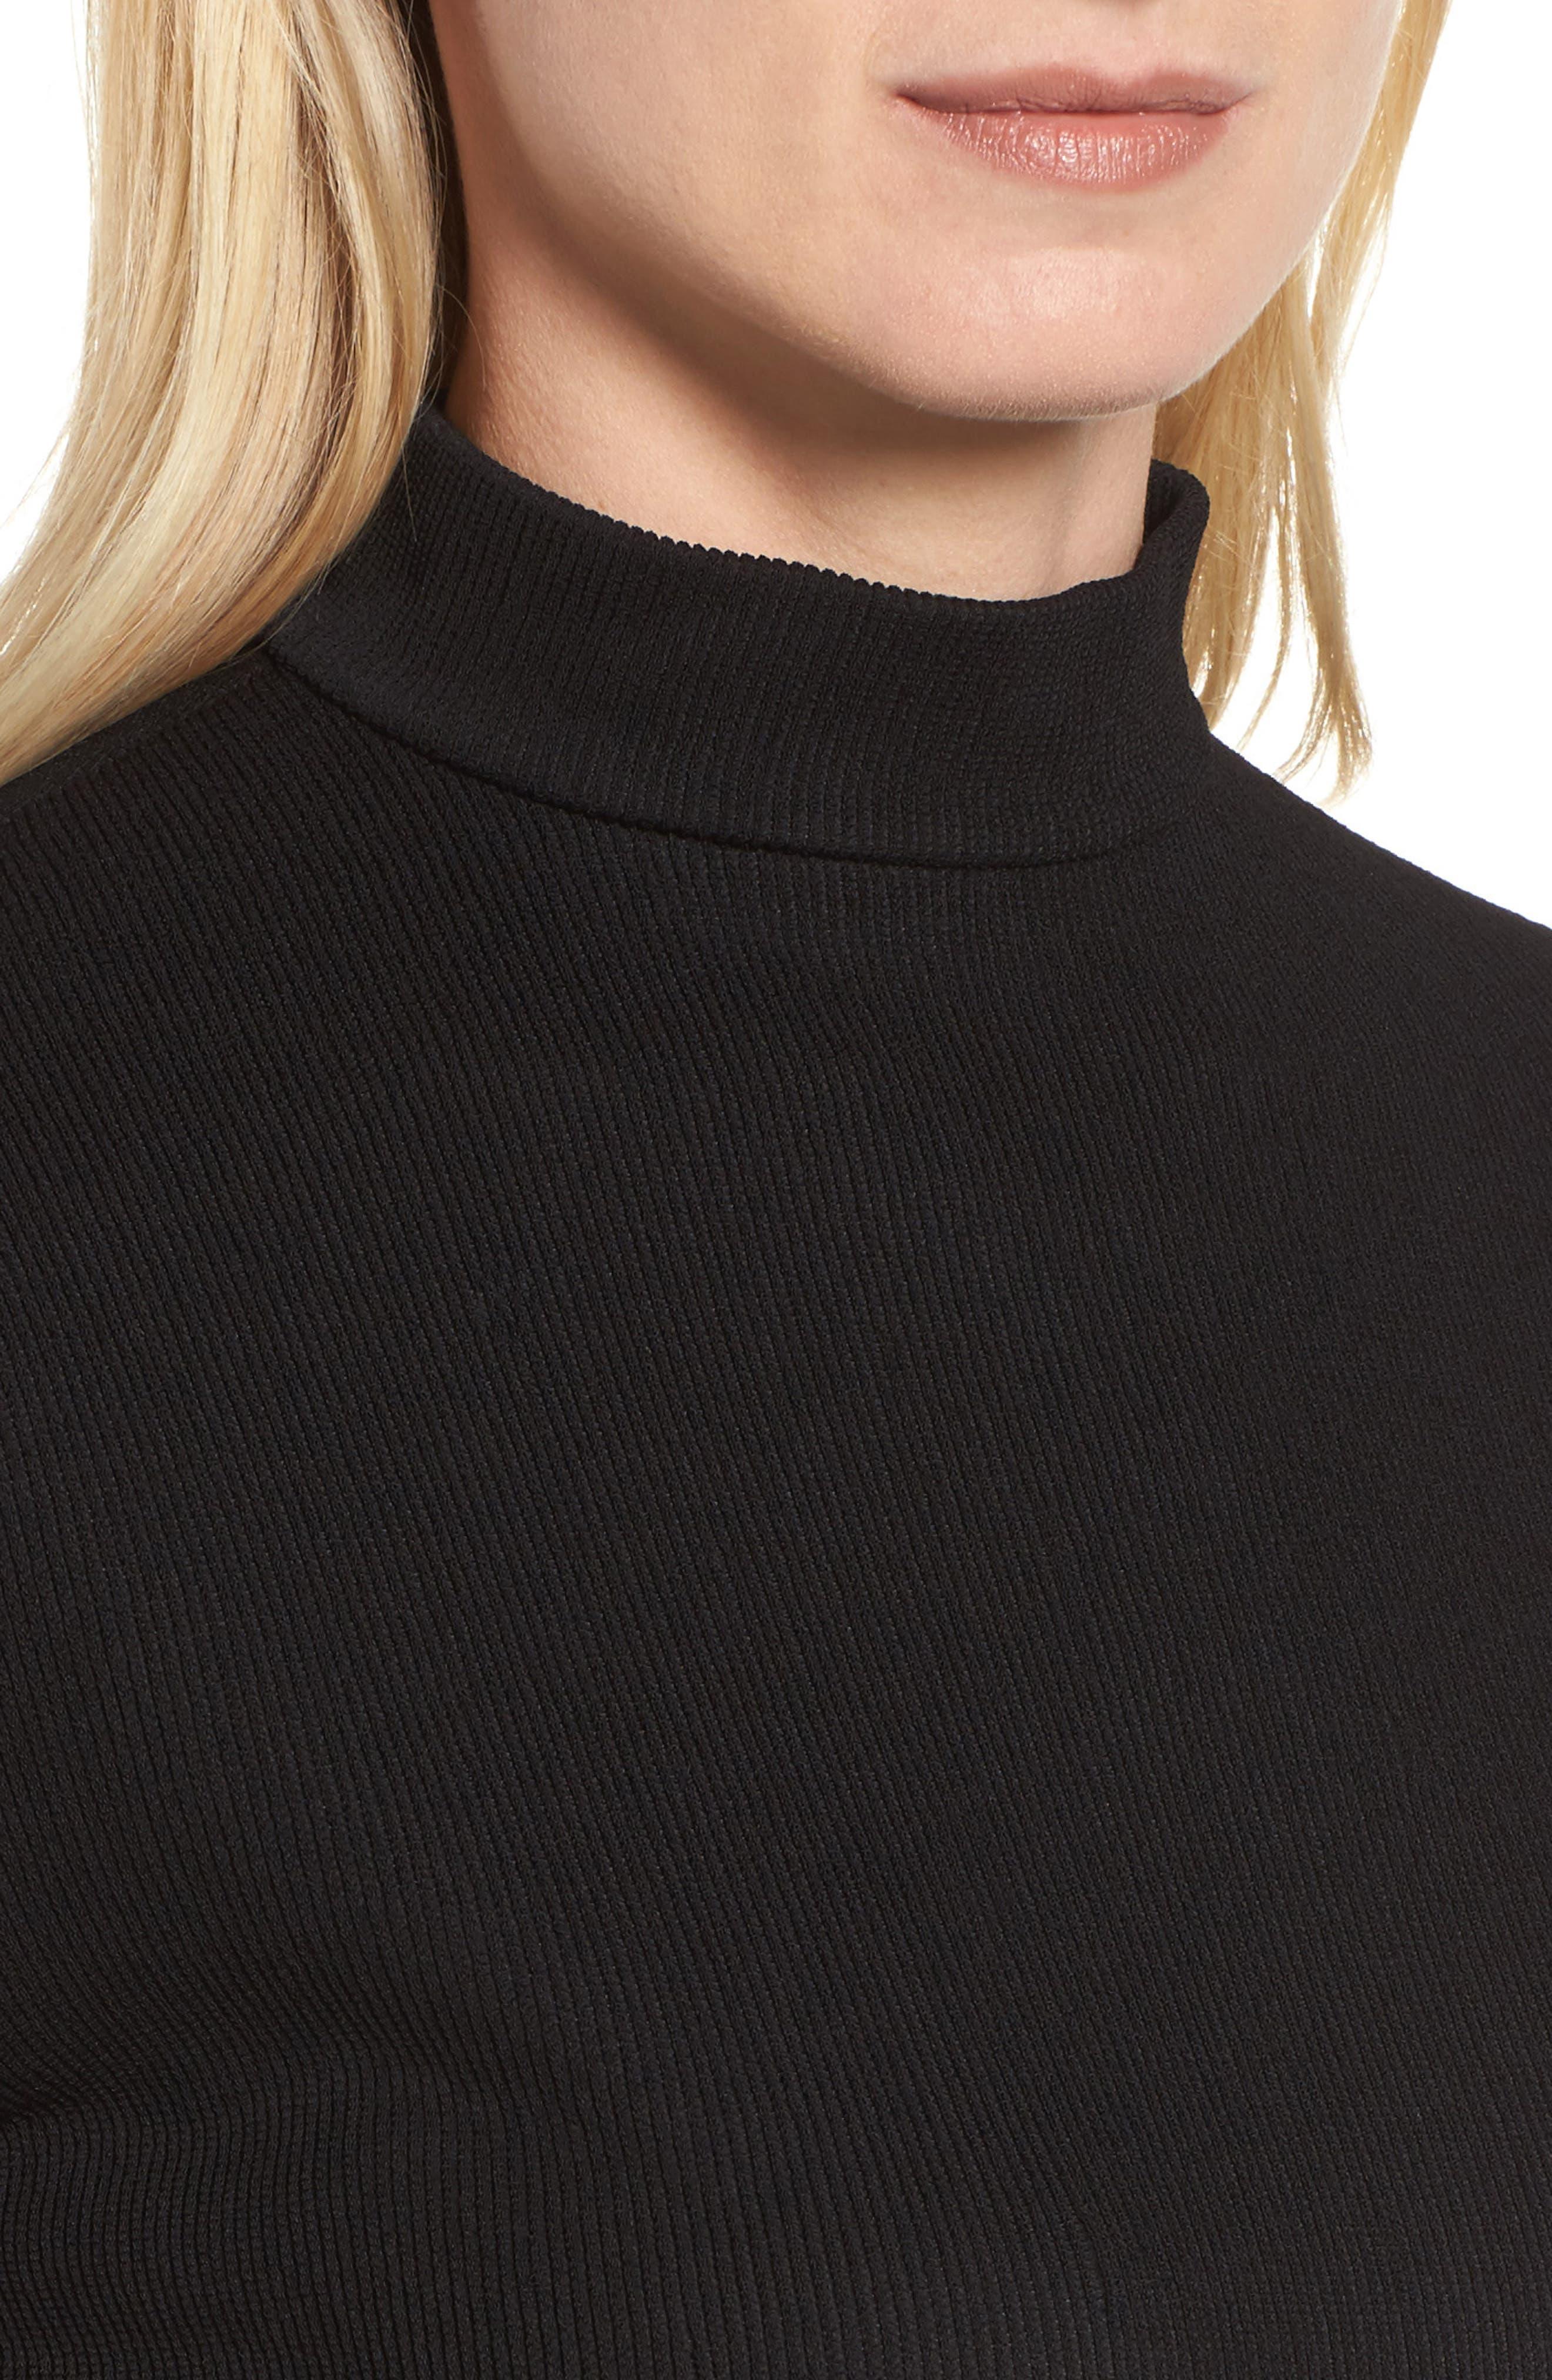 Etelina Sweater,                             Alternate thumbnail 4, color,                             001